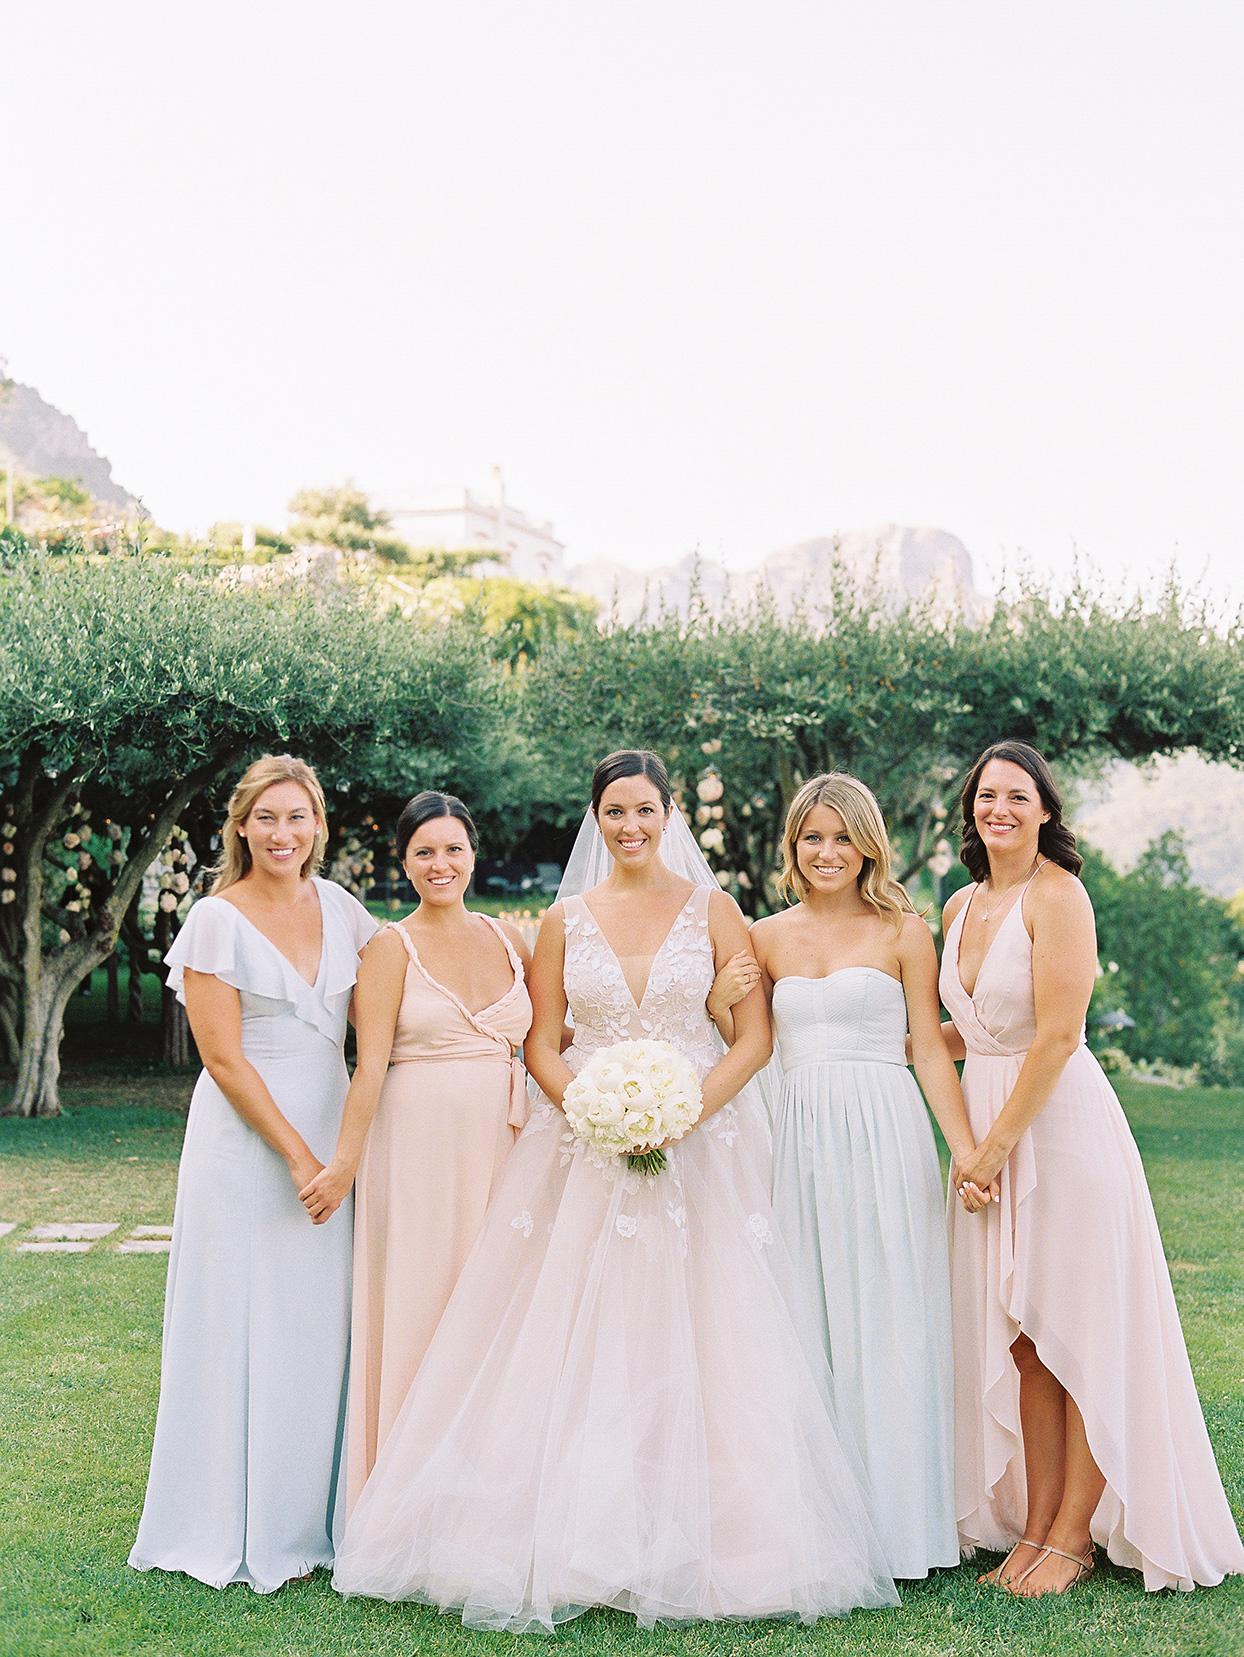 jacqueline david wedding bridesmaids in pastels